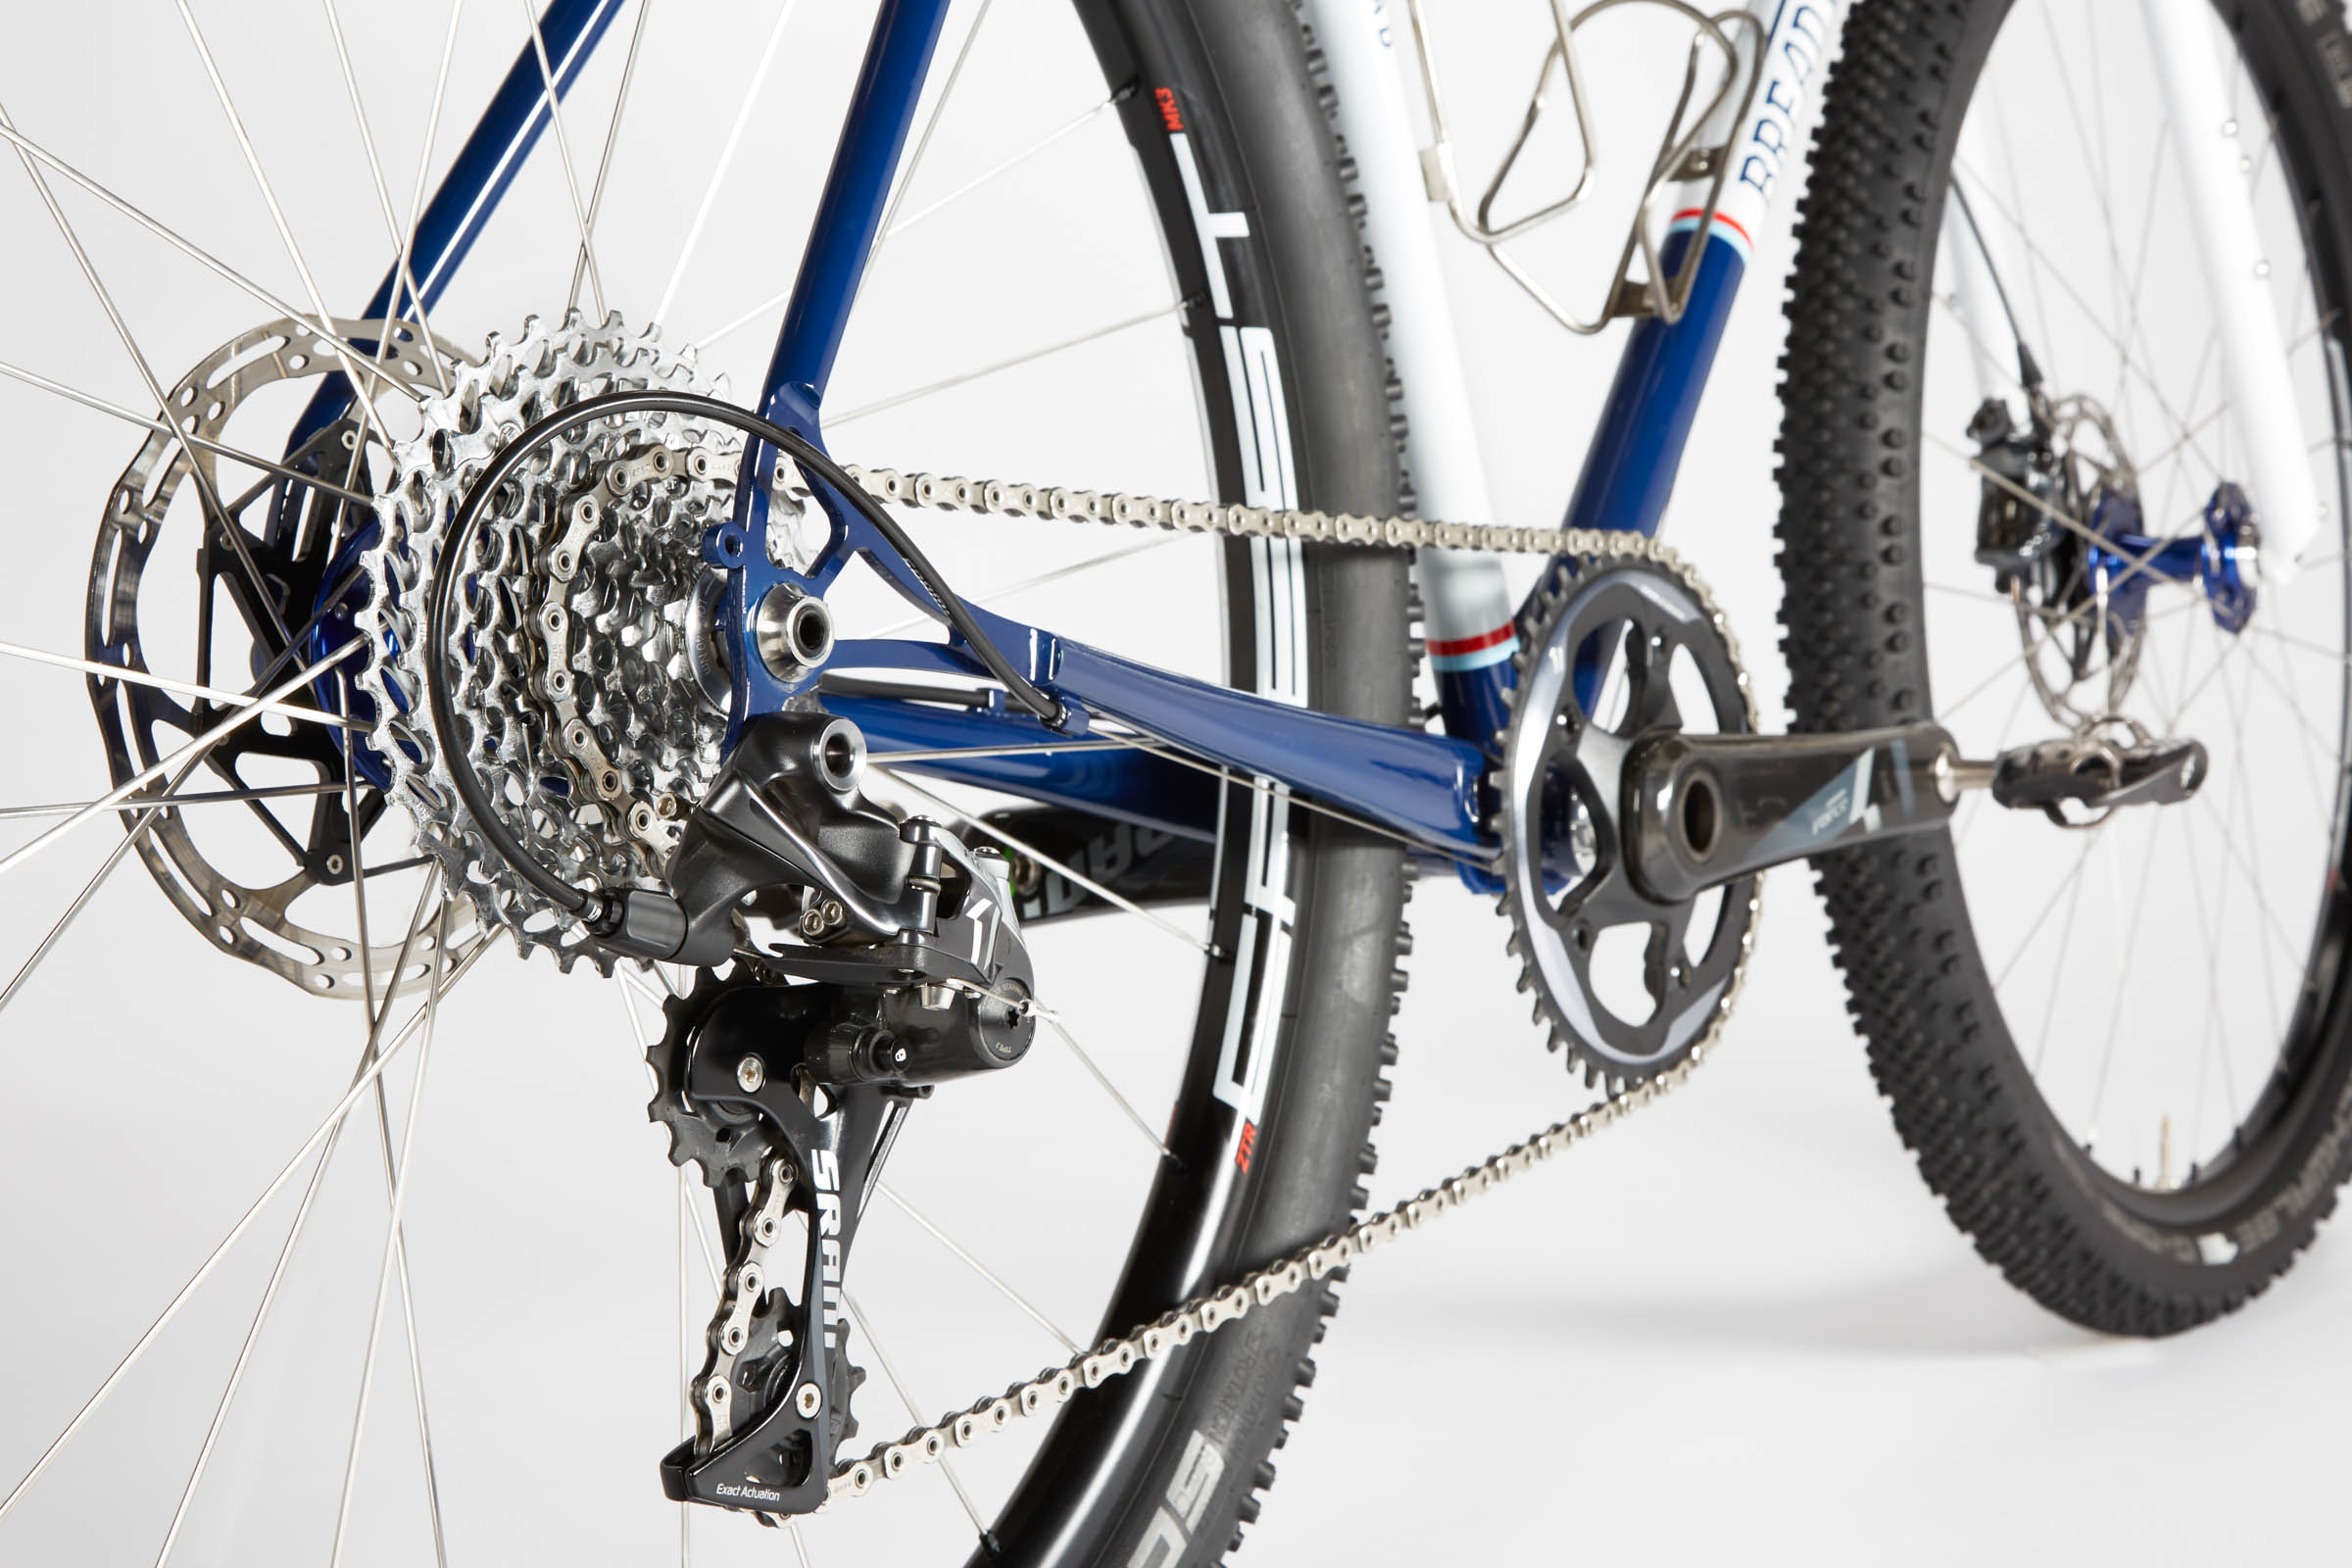 breadwinner_cycles_custom_steel_bikes_portland_oregon_G-Road_gravel_bike_features_options-03